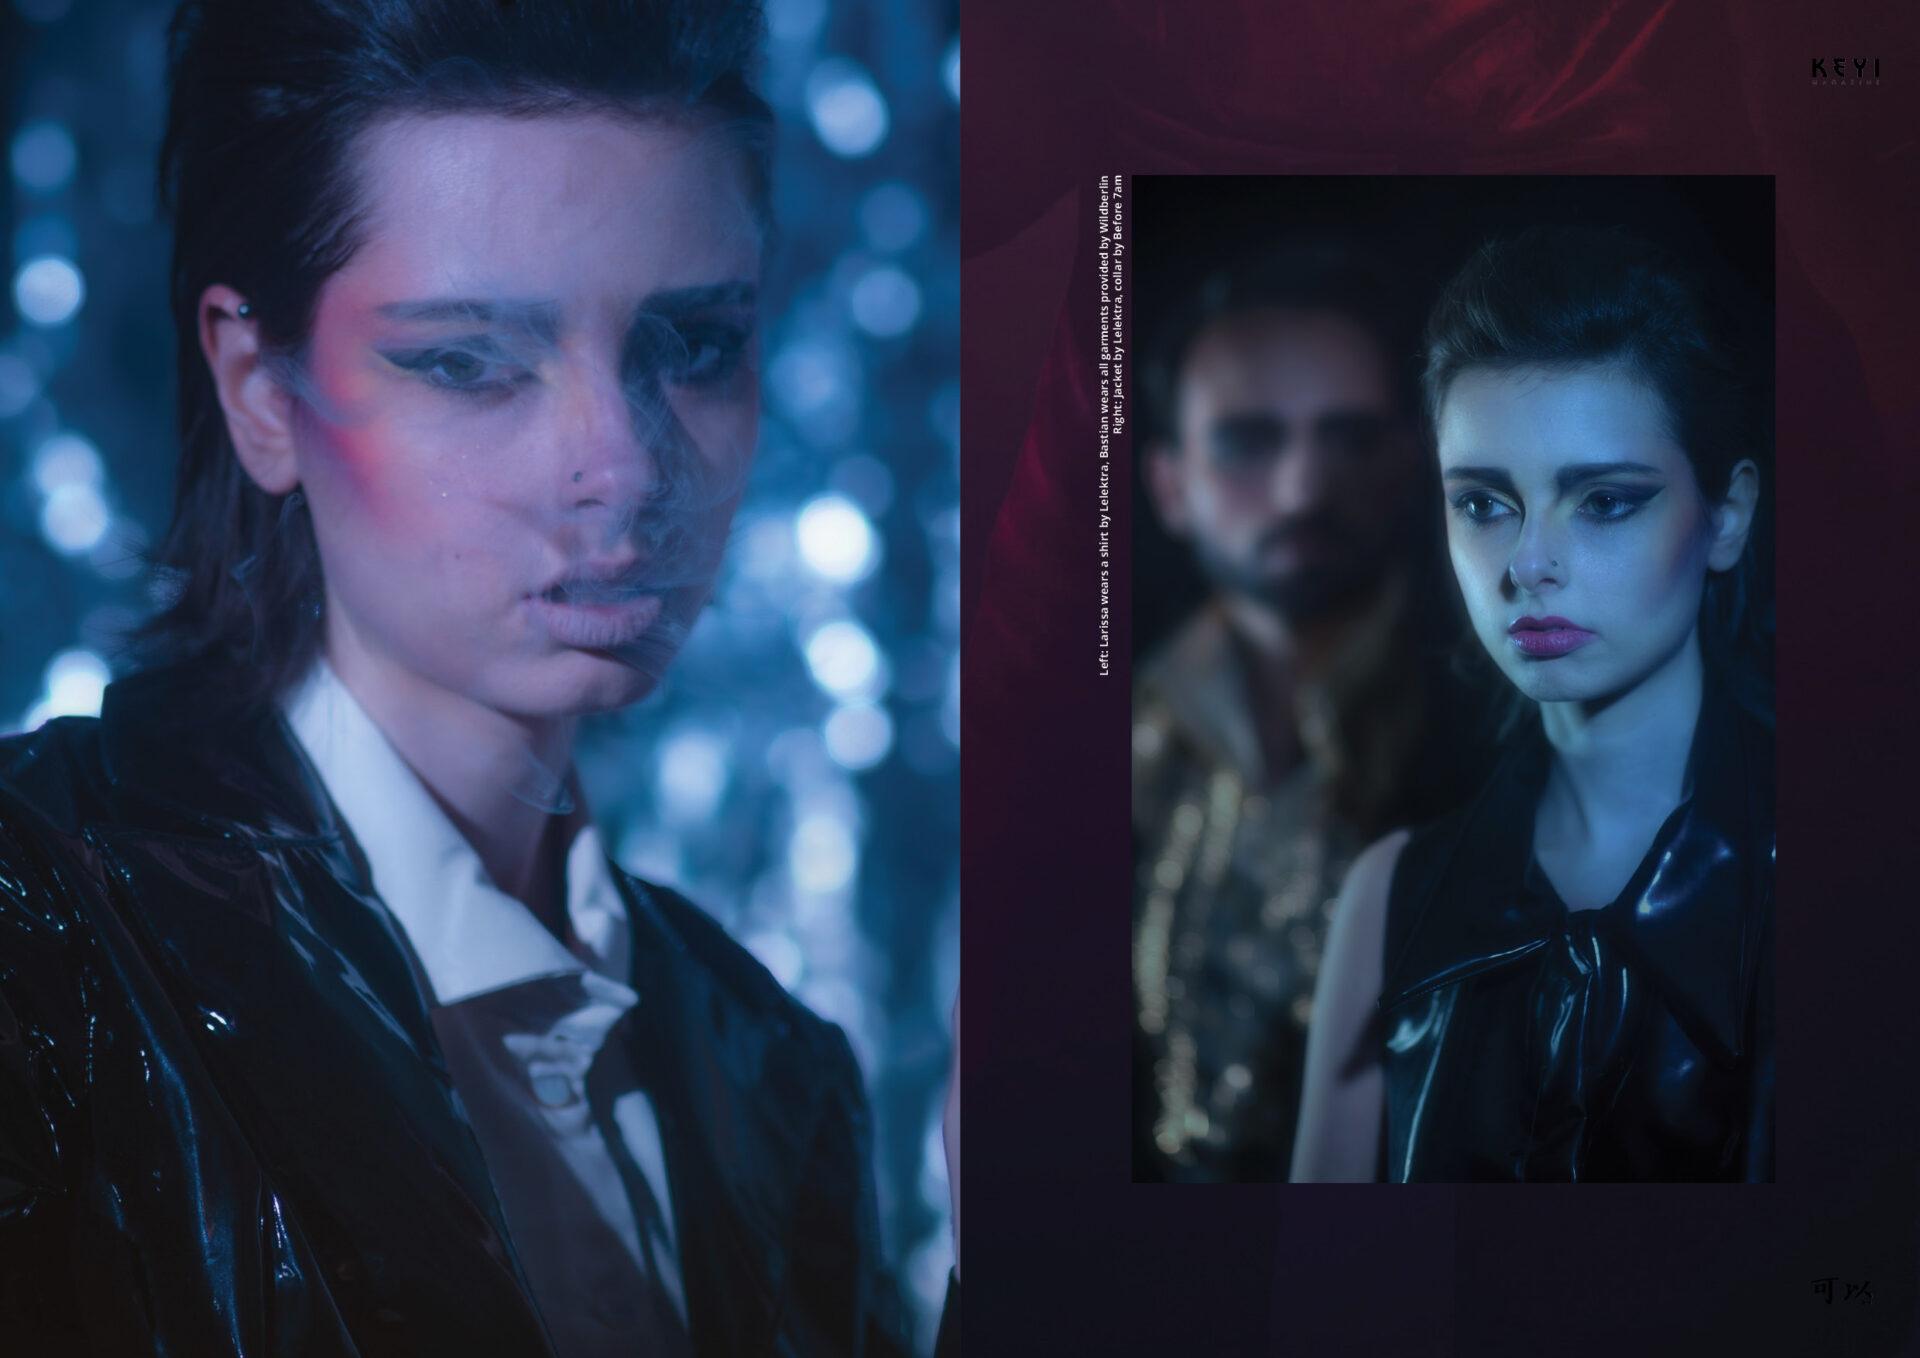 """Space Cowboys"" by Joel Ivan Thomas with Larissa Matheus & Bastian Castillo. Styling by Lisa Eisert. Make up by Carmen Meyer"